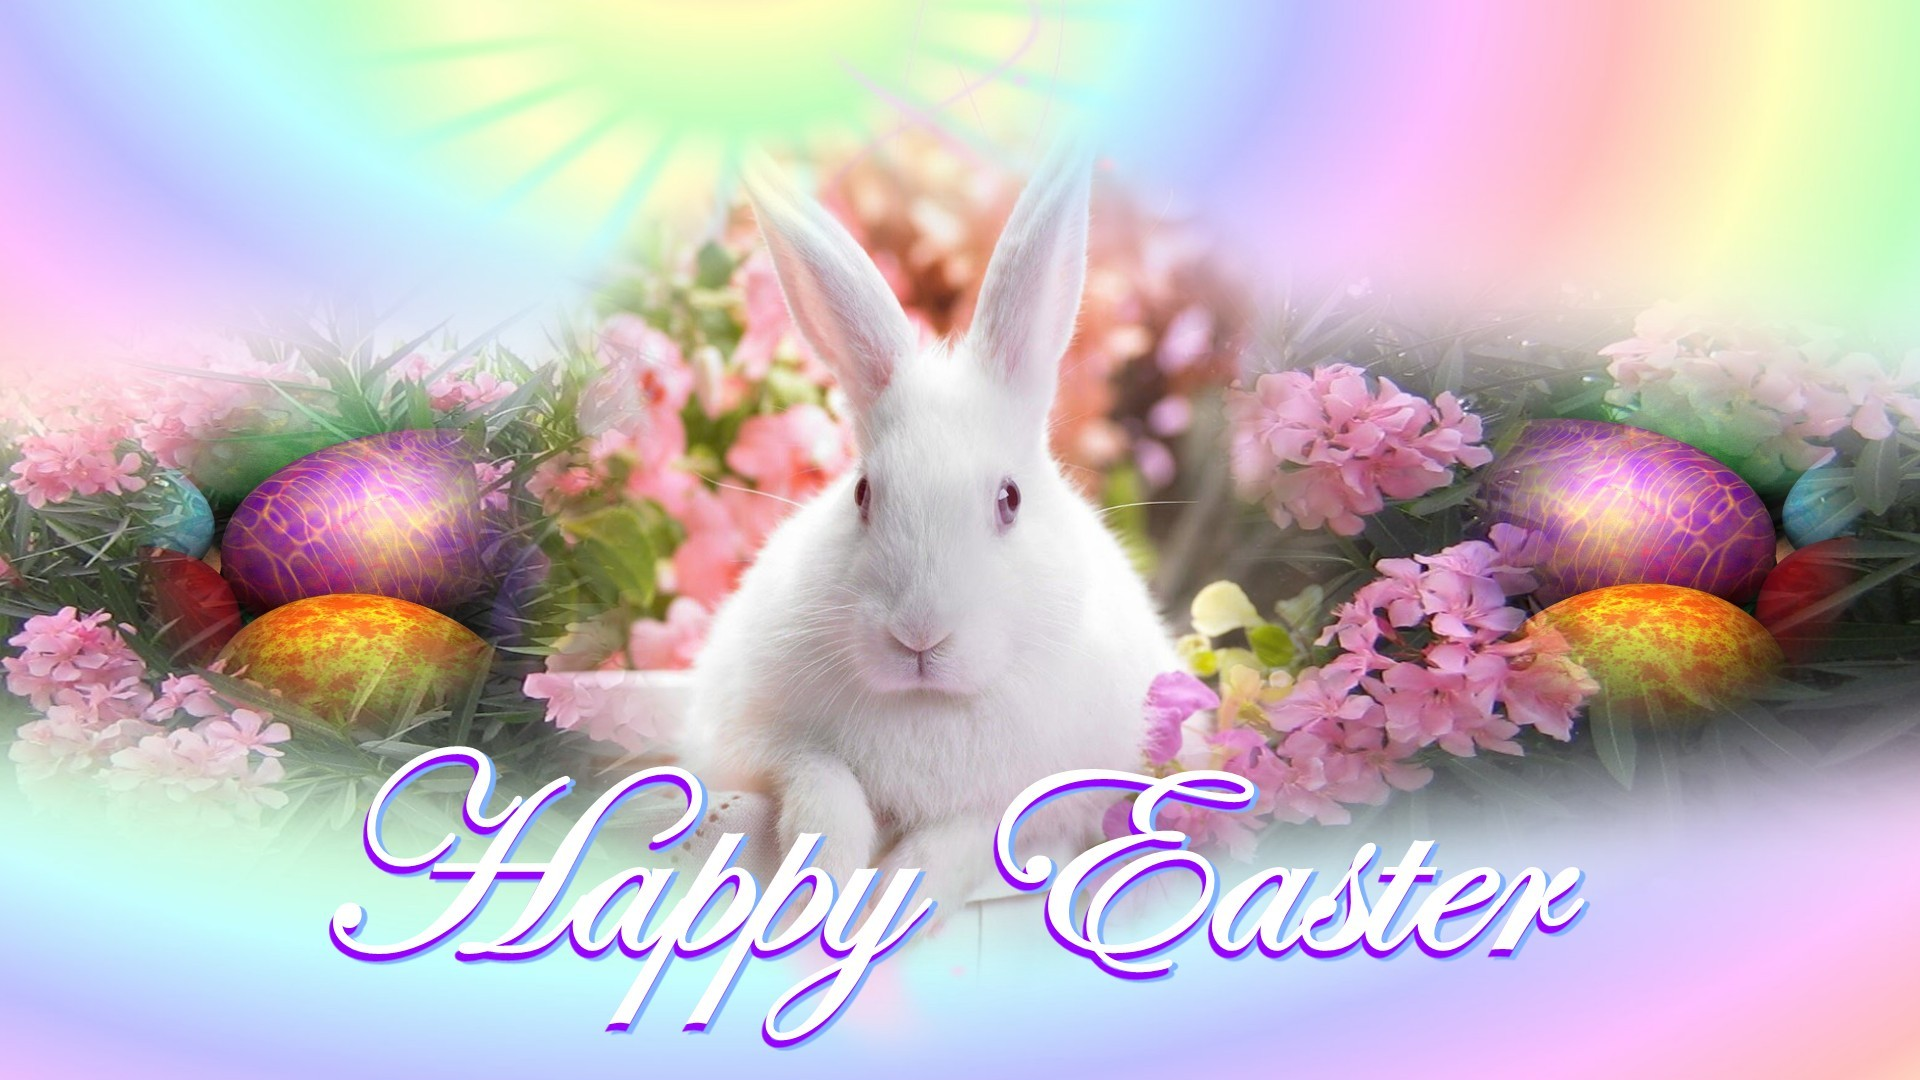 Free Download Description Happy Easter Bunny 2013 Is A Hi Res